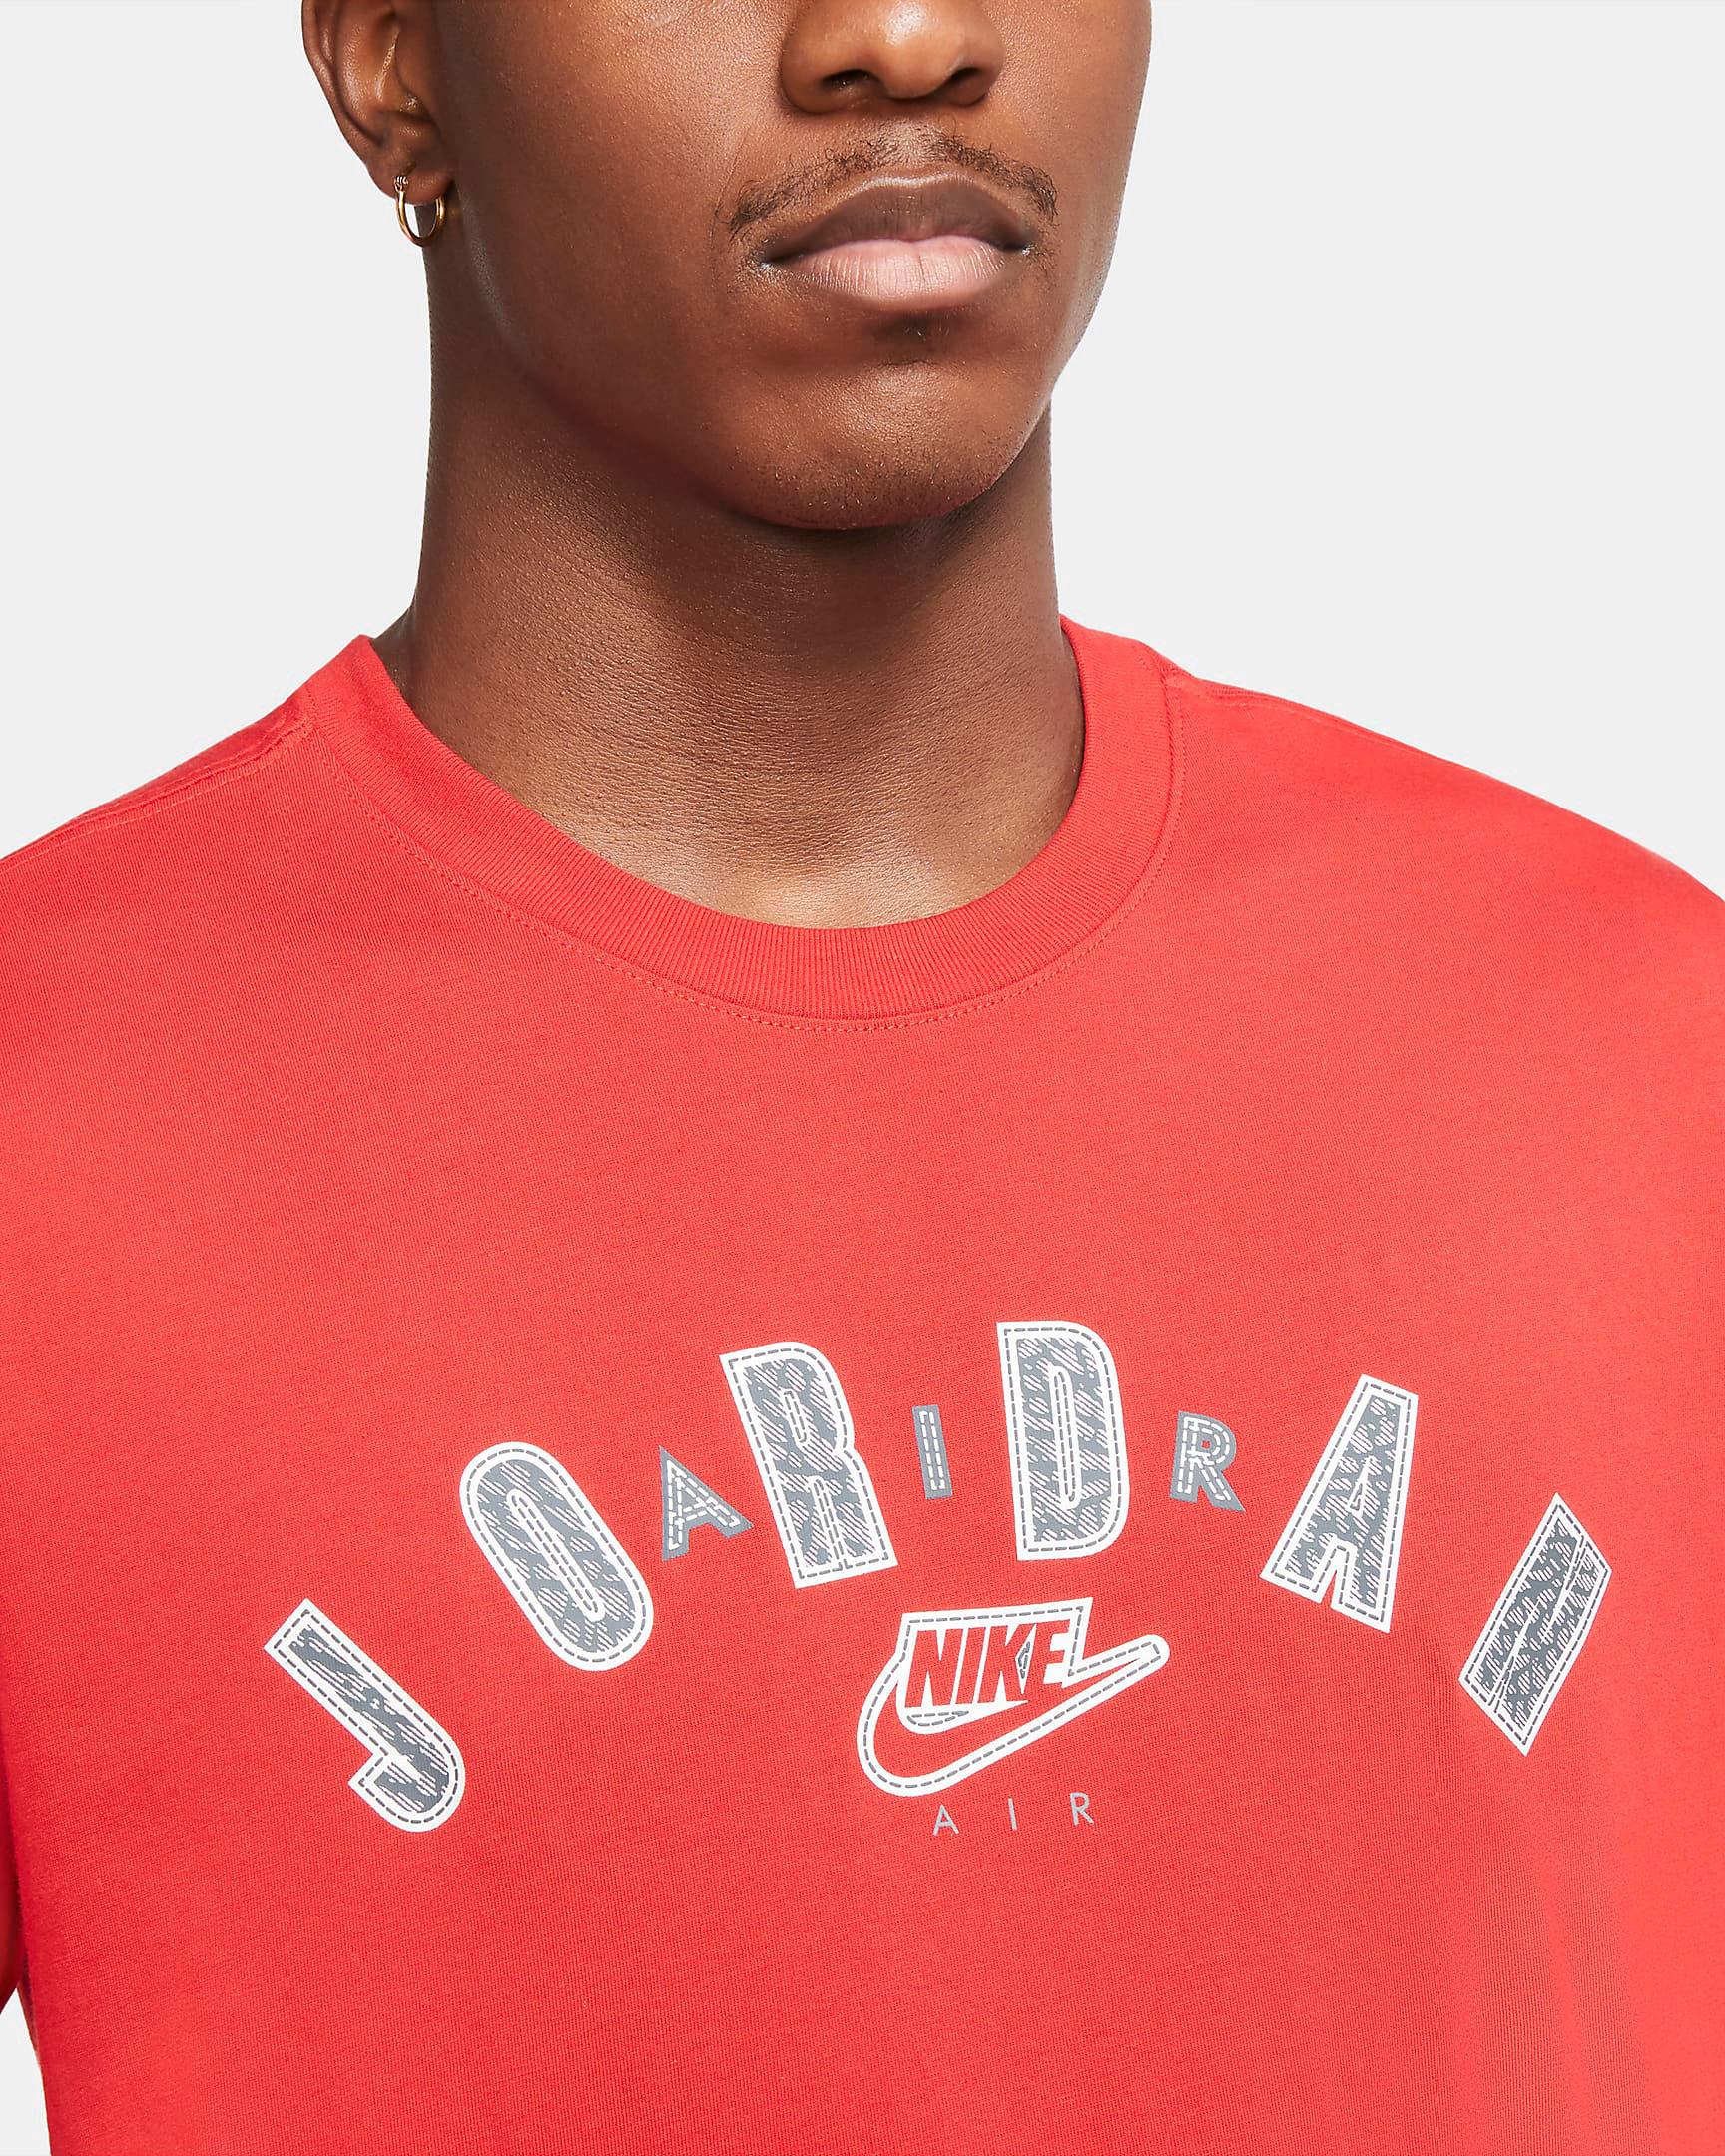 jordan-3-denim-fire-red-tee-shirt-1